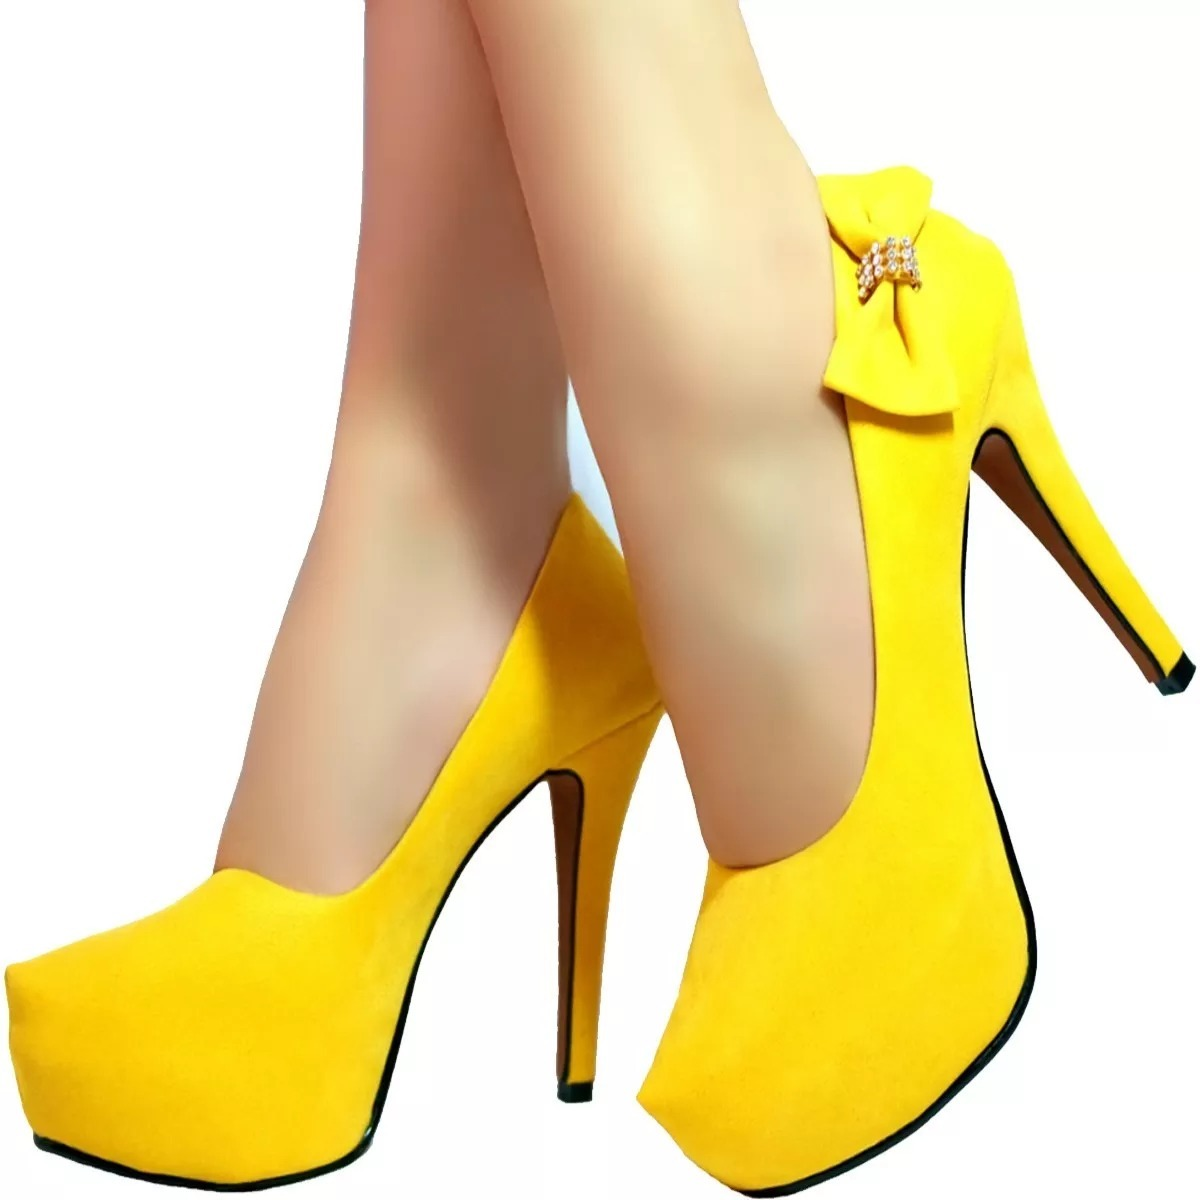 586e492962 sapato scarpin feminino 1 salto alto amarelo laço salto fino. Carregando  zoom.